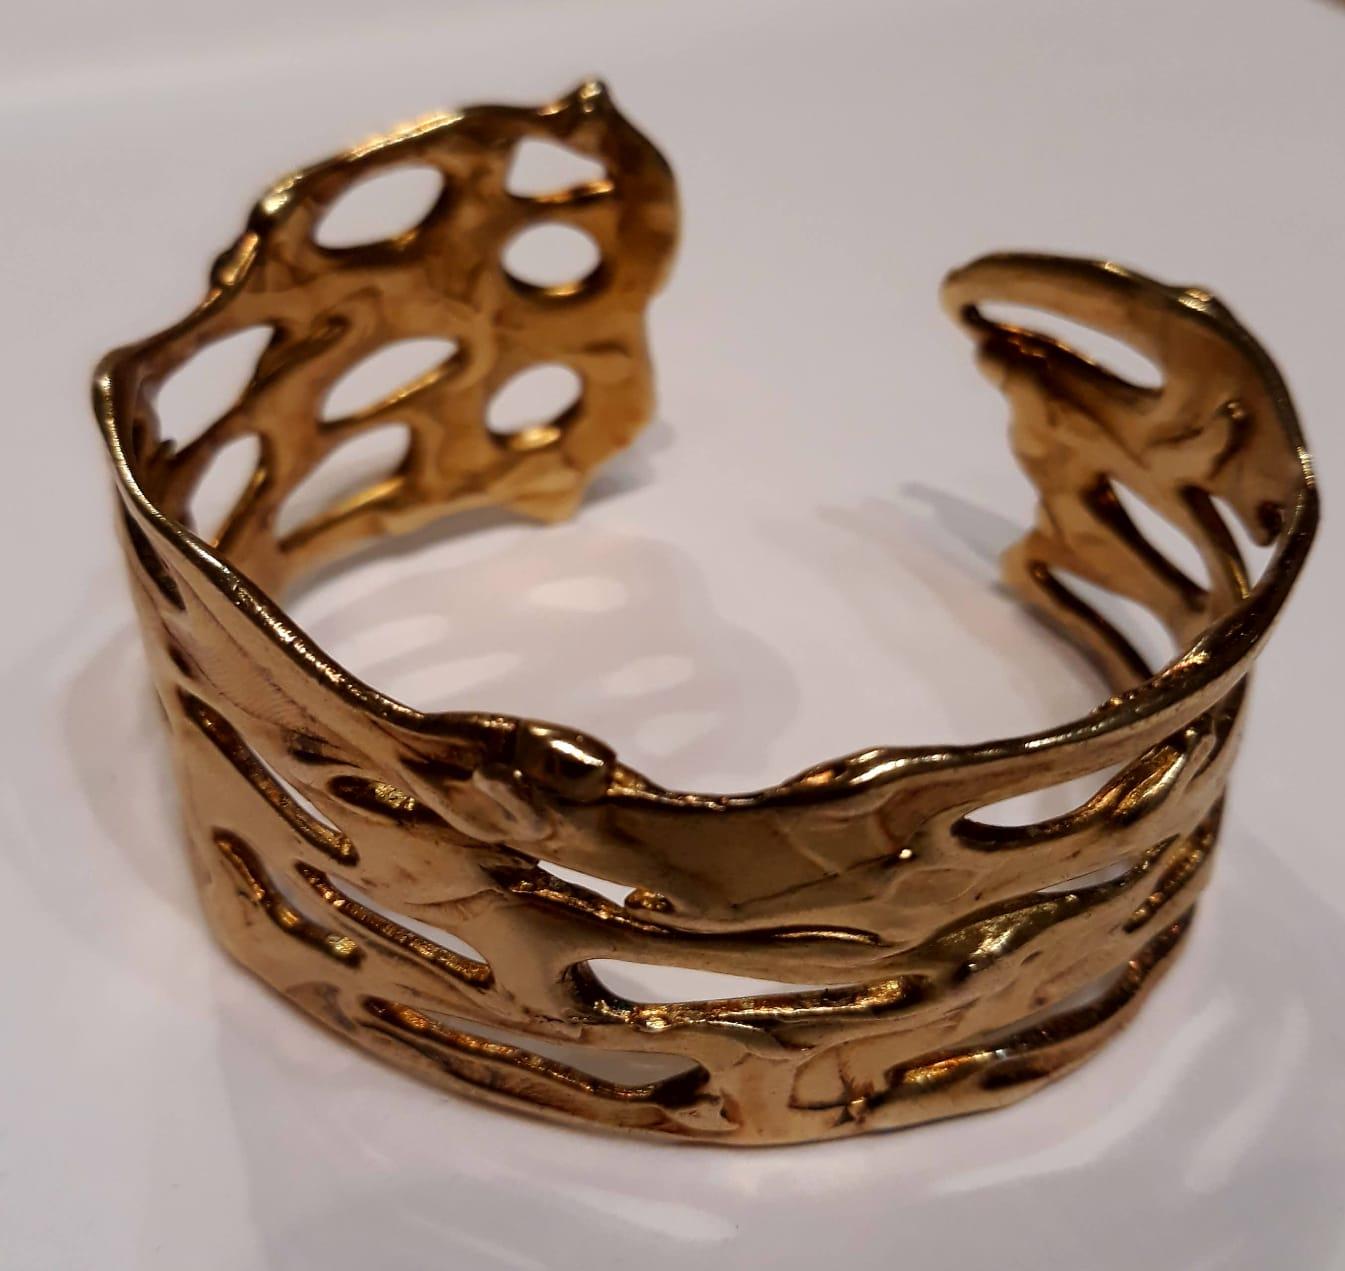 brazalete dorado para mujer, pepamassana barcelona, regalar pulsera de diseño, joyeria natural, joyasmarket